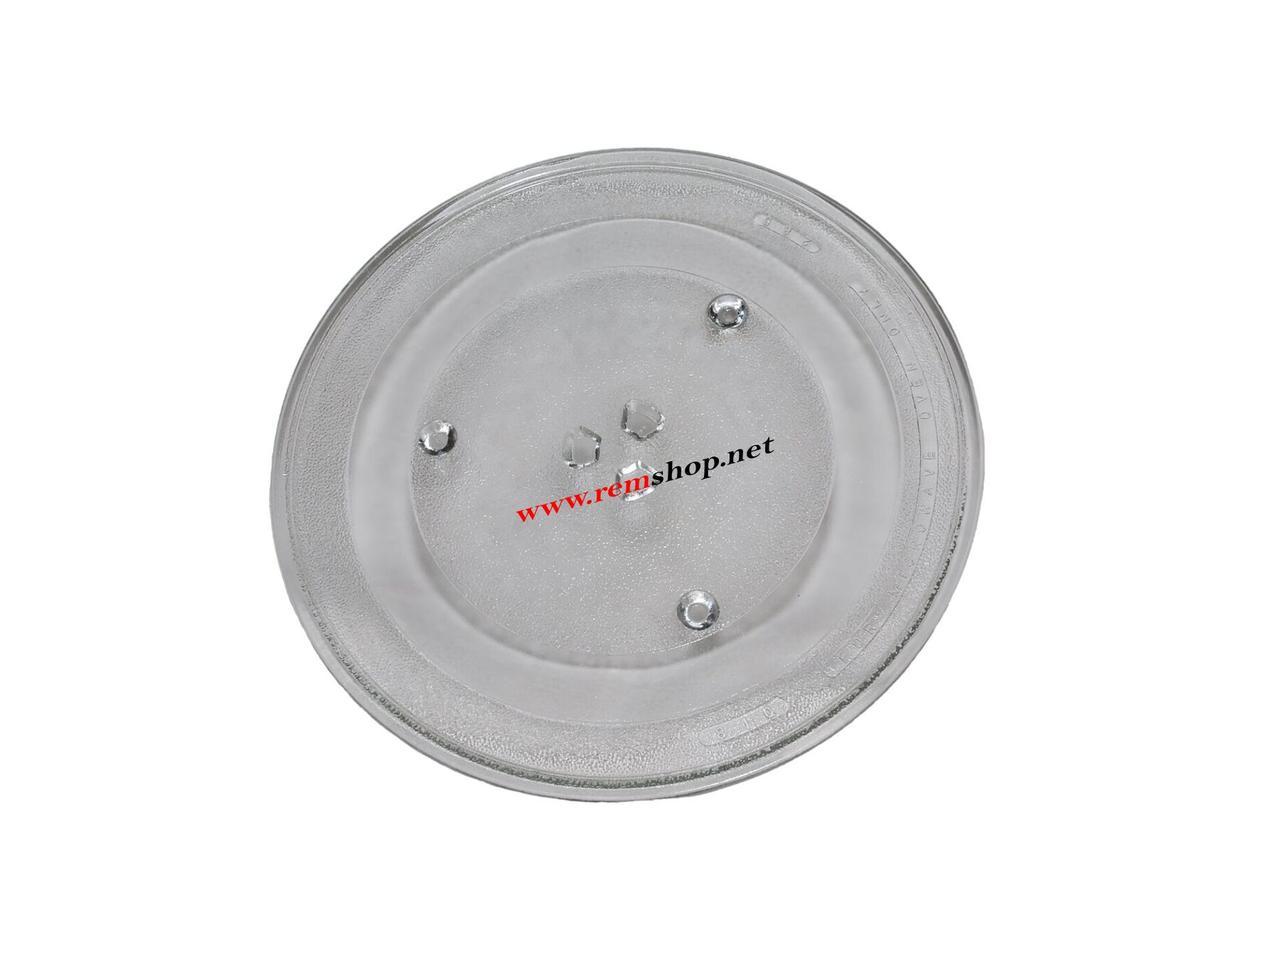 Тарелка для микроволновой печи Samsung CE 2944N